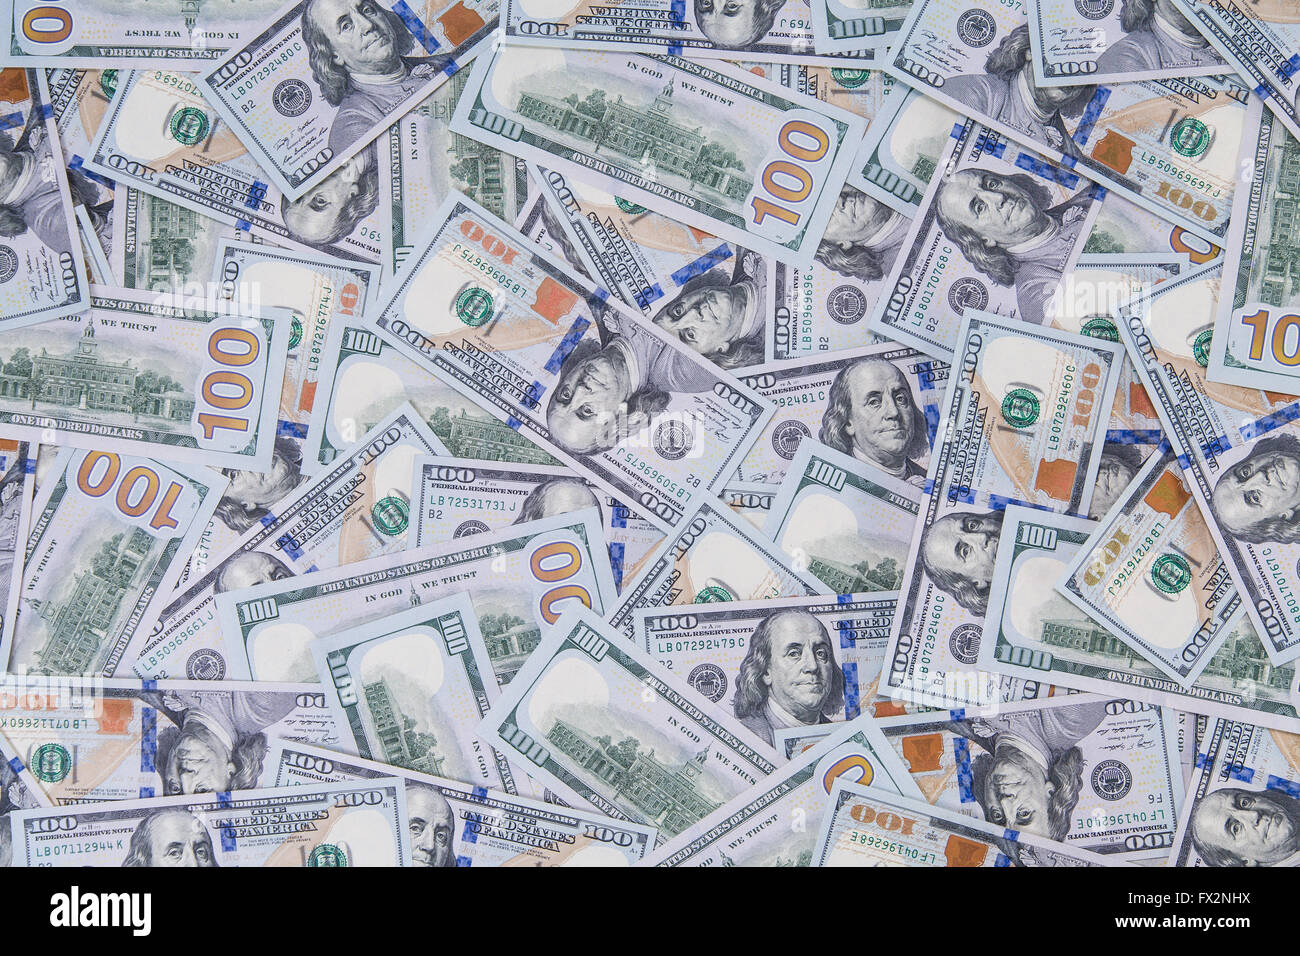 Background of new styled hundred dollar bills - Stock Image